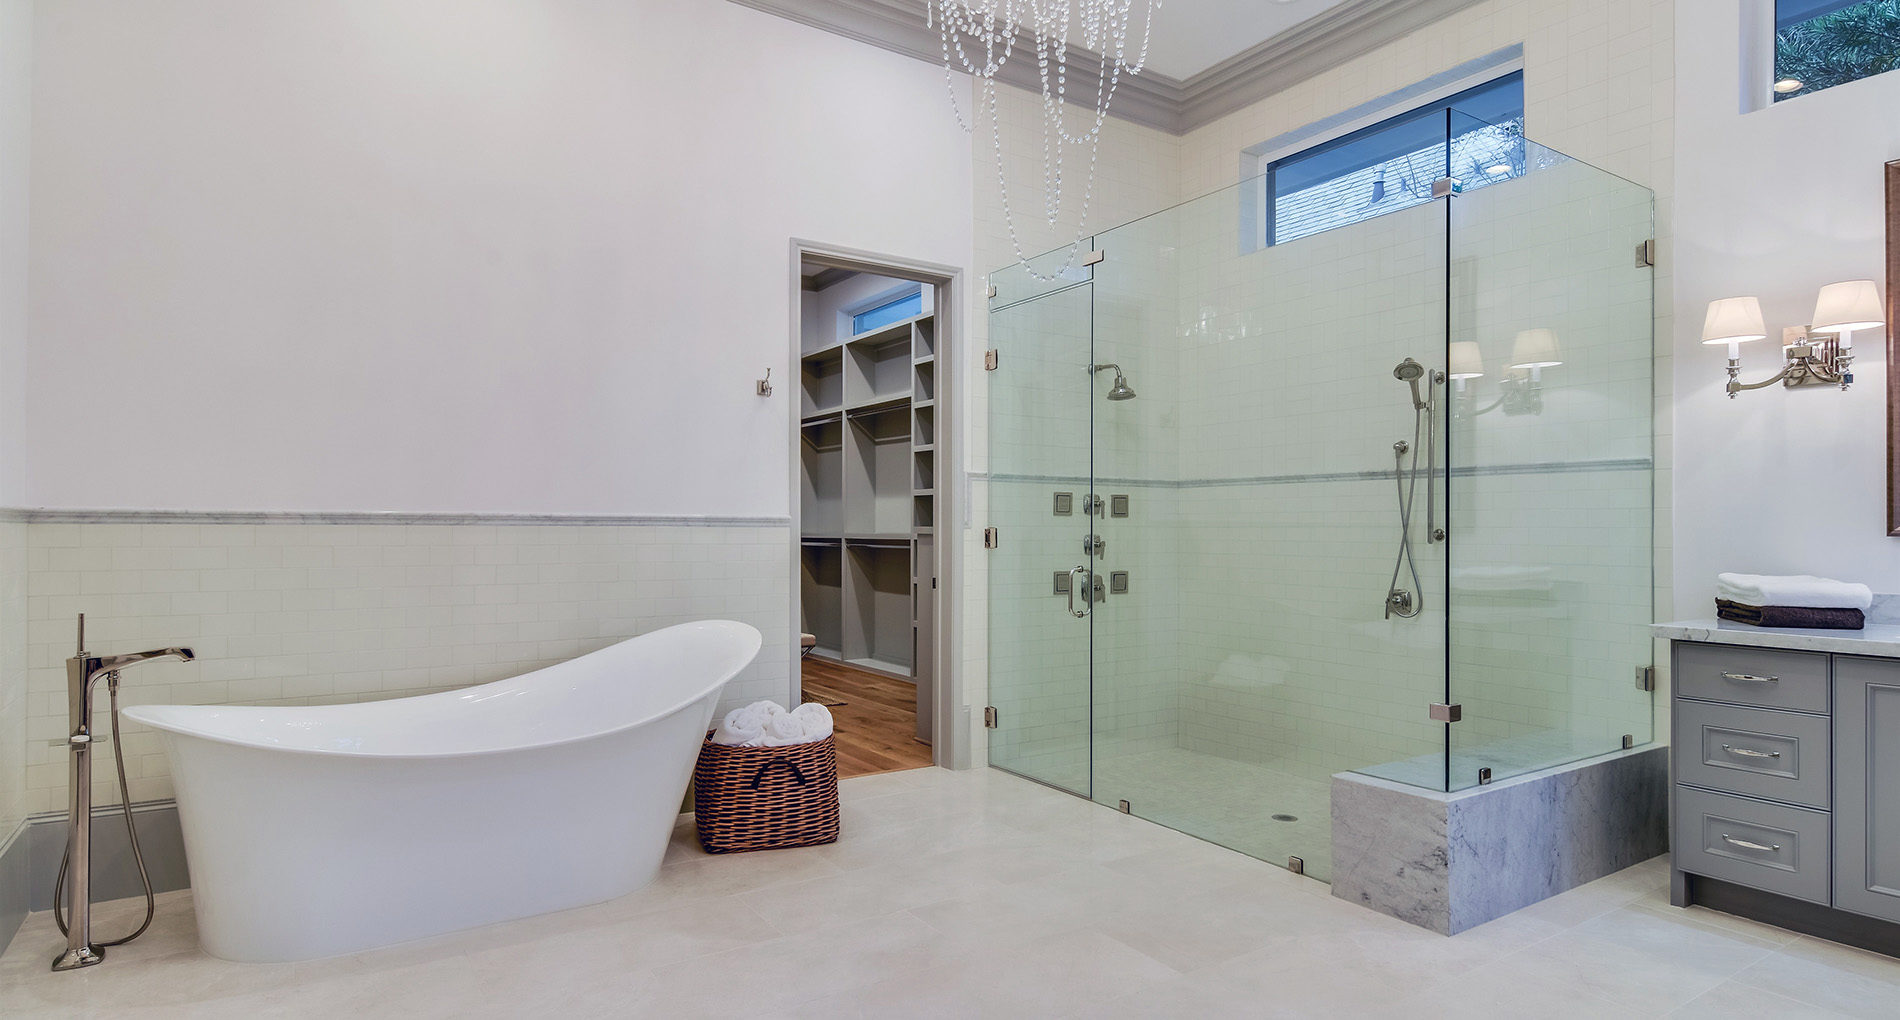 Bathroom Remodel Longmont Maplevalley Slider